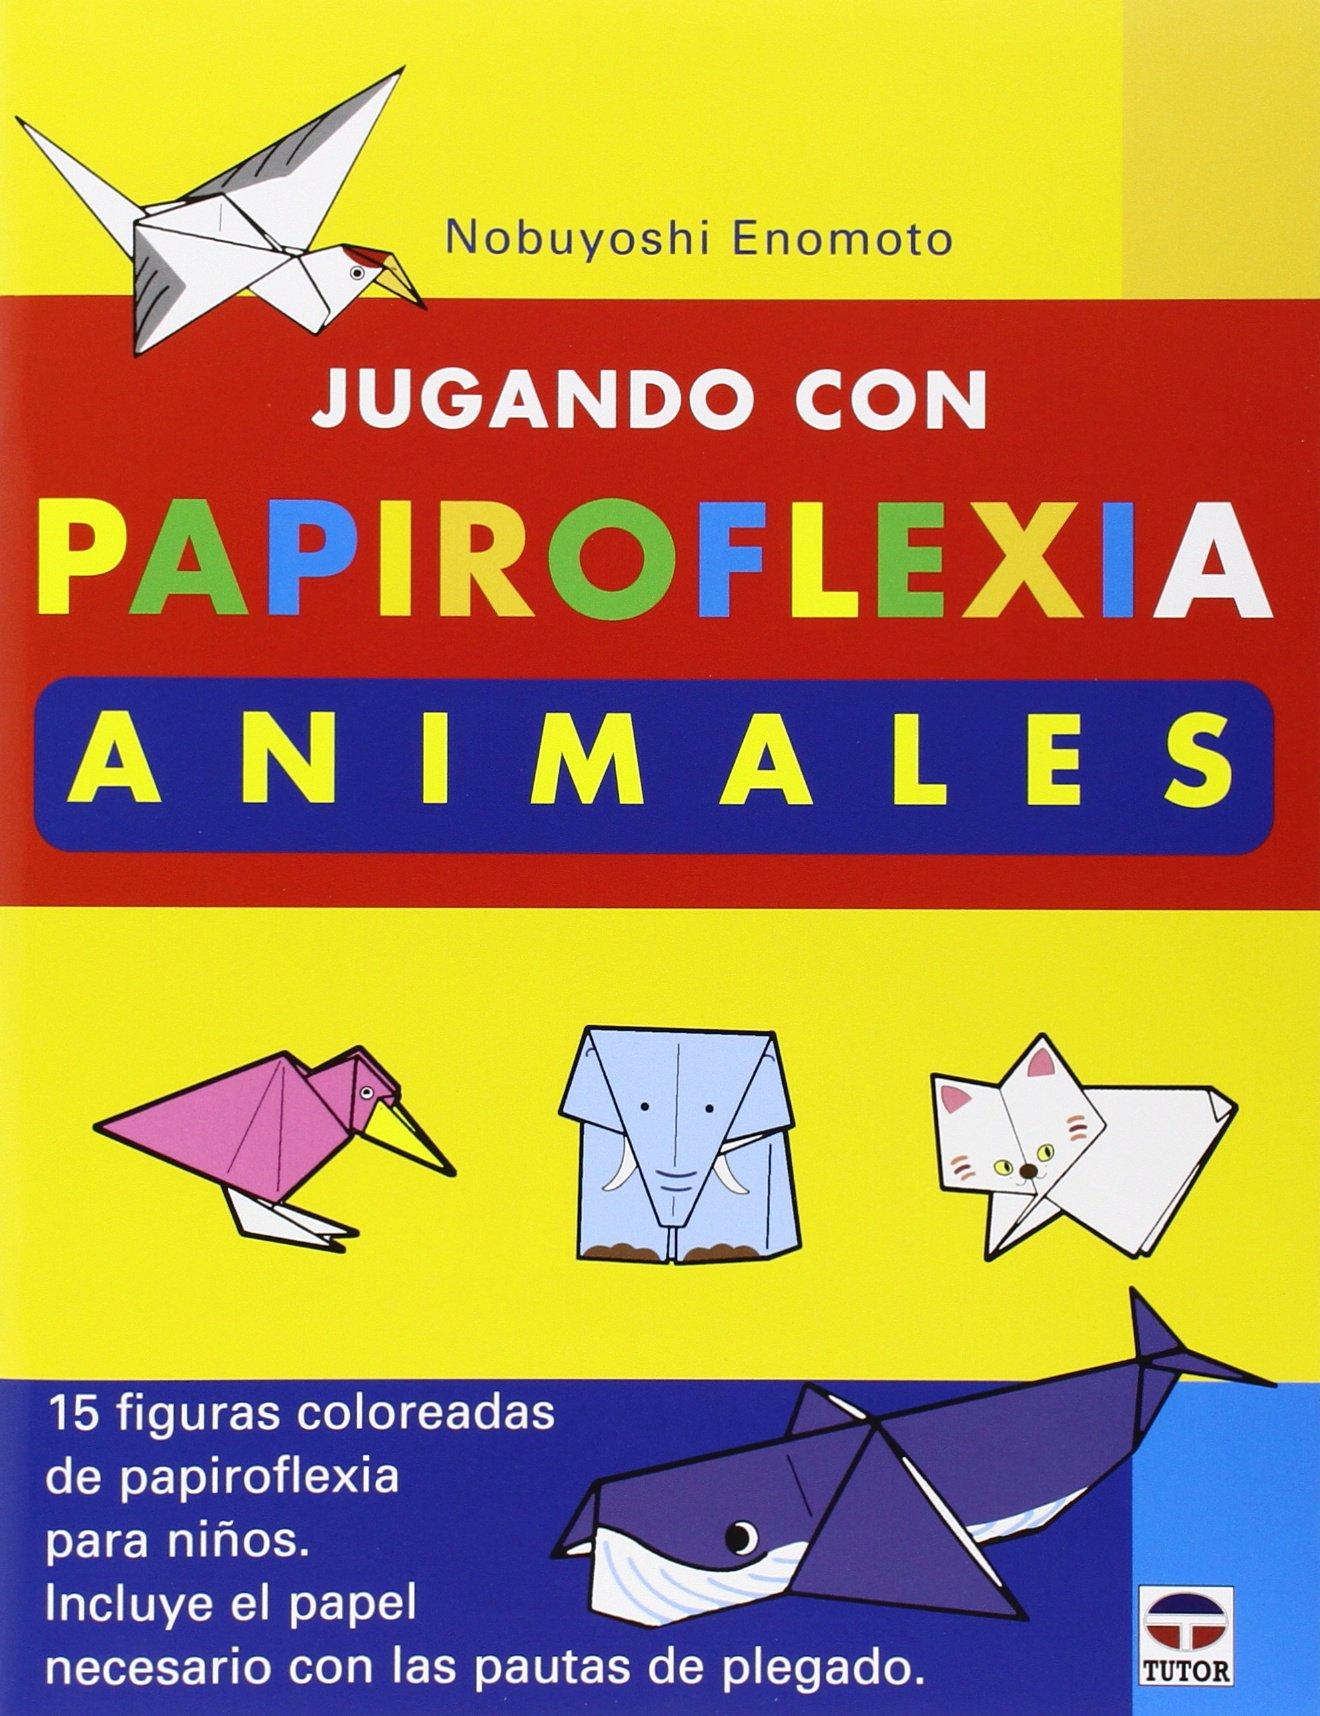 PACK NAVIDAD 2014 15 (PAPIROFLEXIA ANIMALES + BISUTERIA CON GOMAS) pdf epub